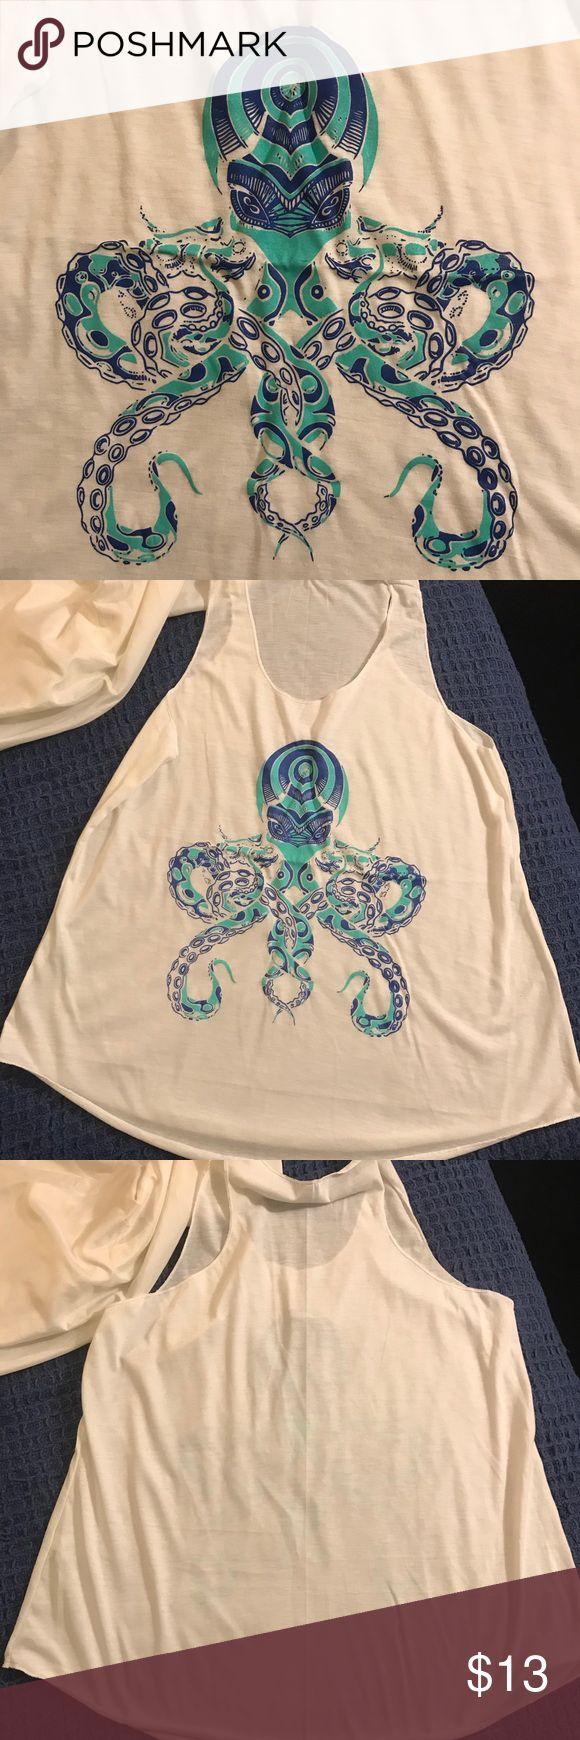 Octopus tank top Fun and artsy octopus tank top Tops Tank Tops